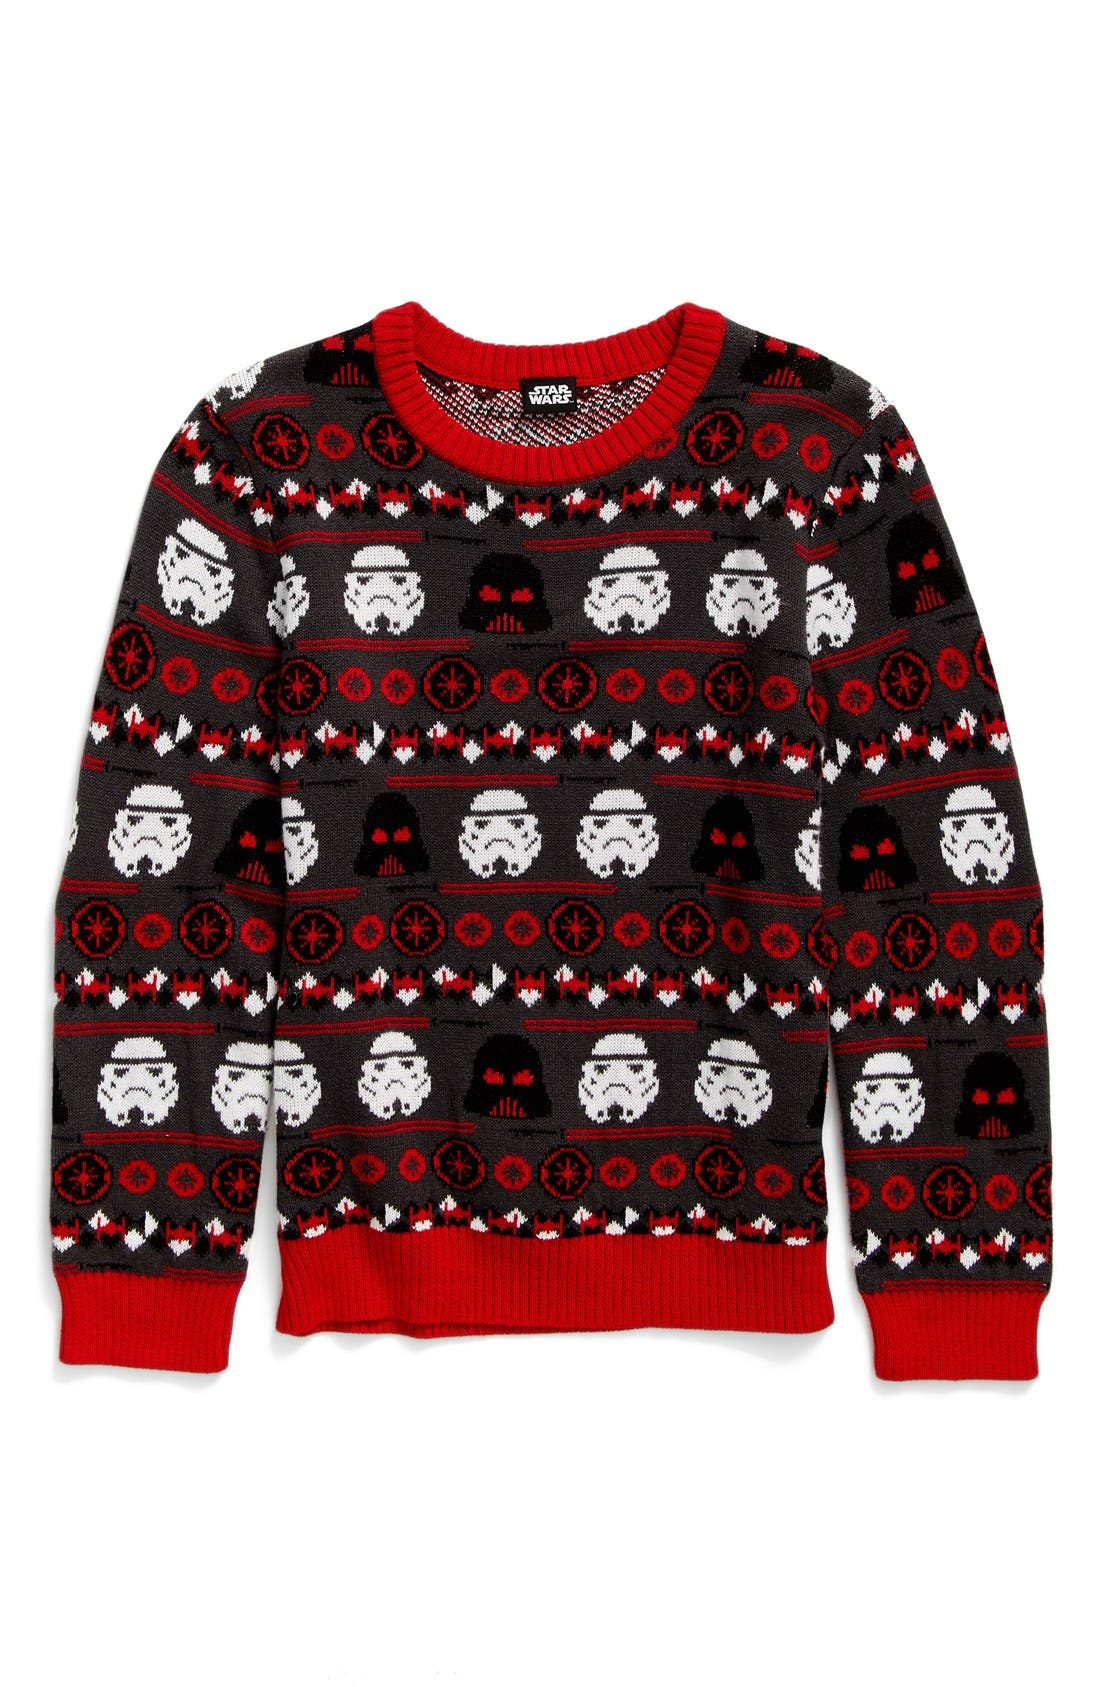 Main Image - Jem Holiday Wars Sweater (Big Boys)